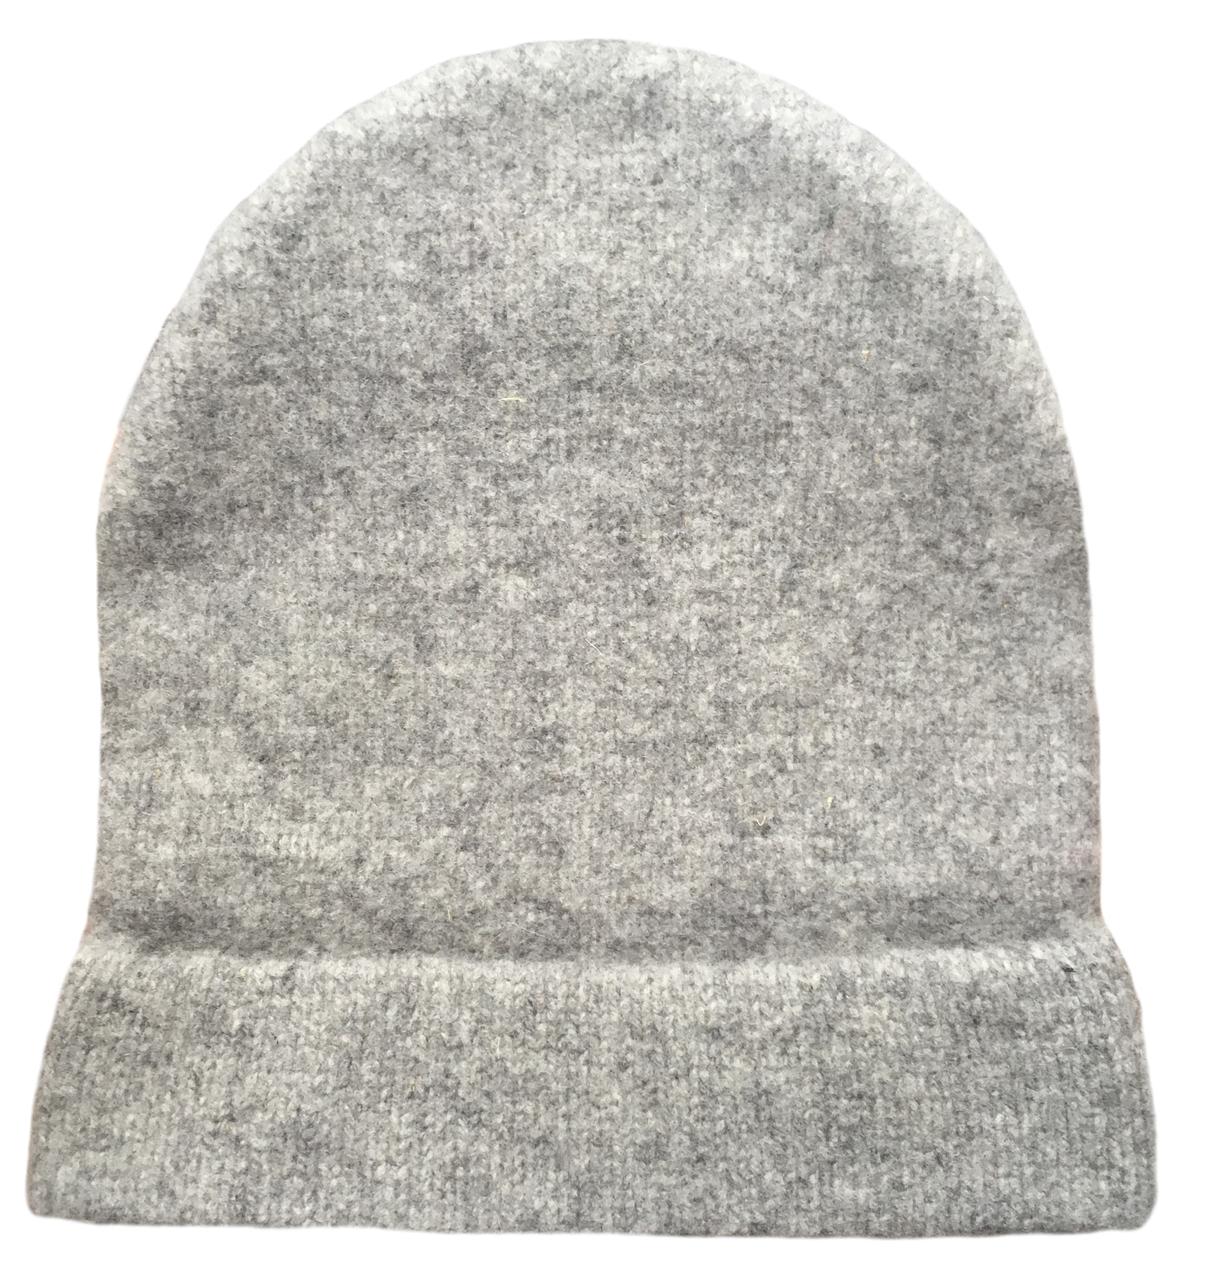 0dee78928a9 Dachstein Woolwear 4 Ply Merino Wool Extreme Warm Cap - Sweater ...